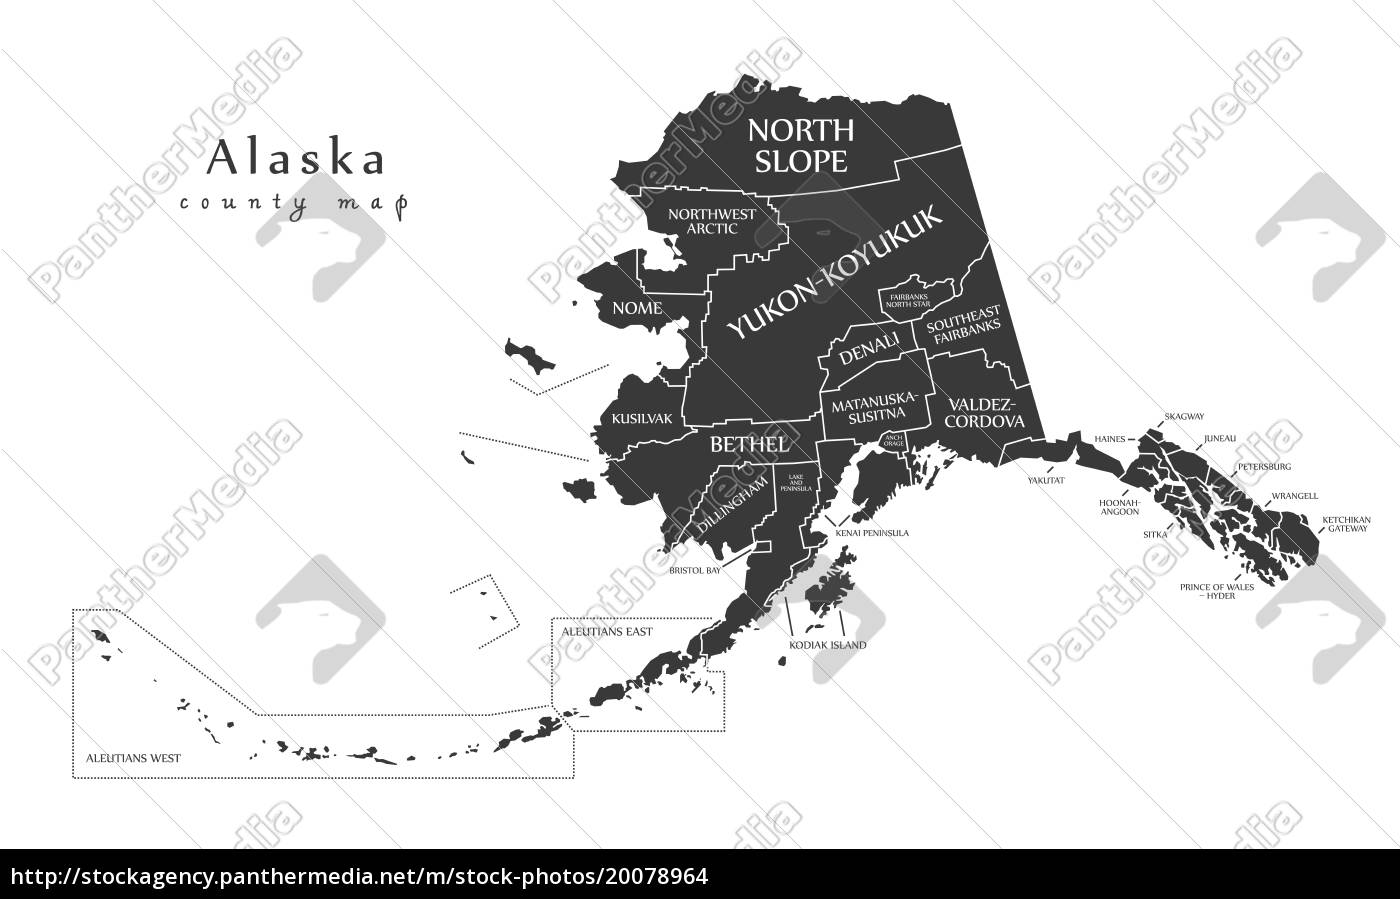 Lizenzfreies Foto 20078964 - moderne karte alaska county map mit den  etiketten usa